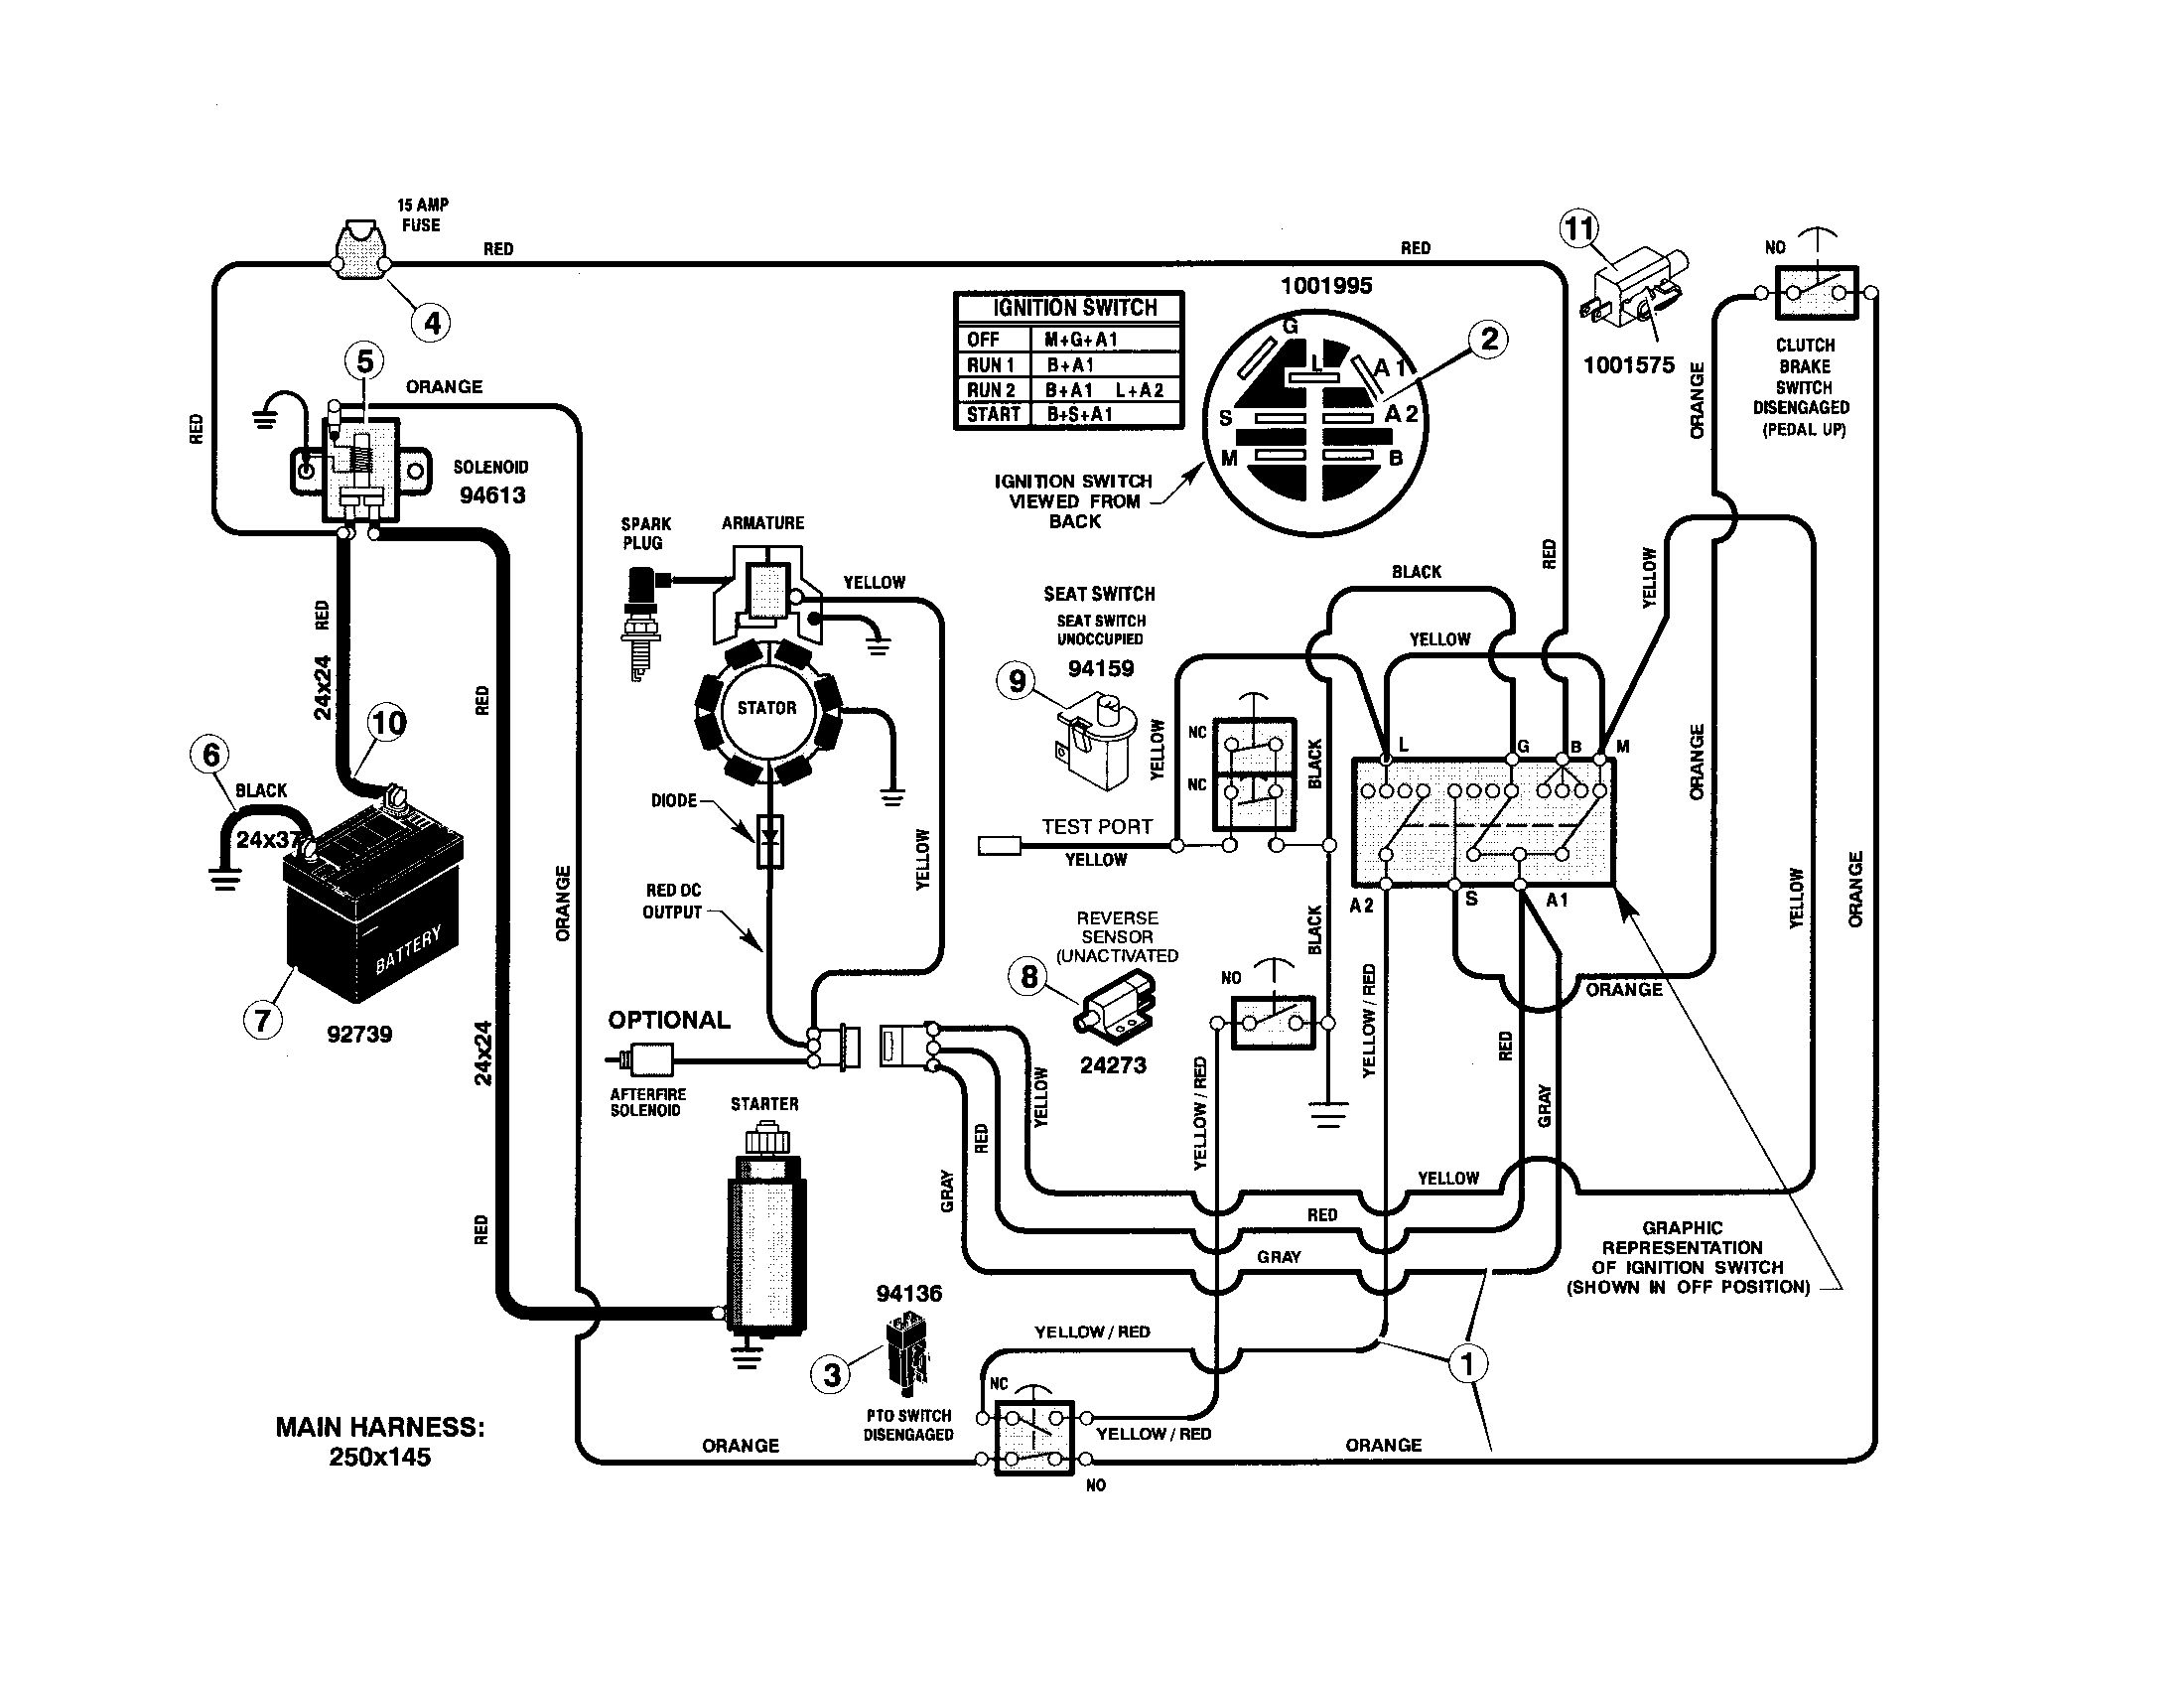 2005 dodge ram 1500 fuel tank diagram